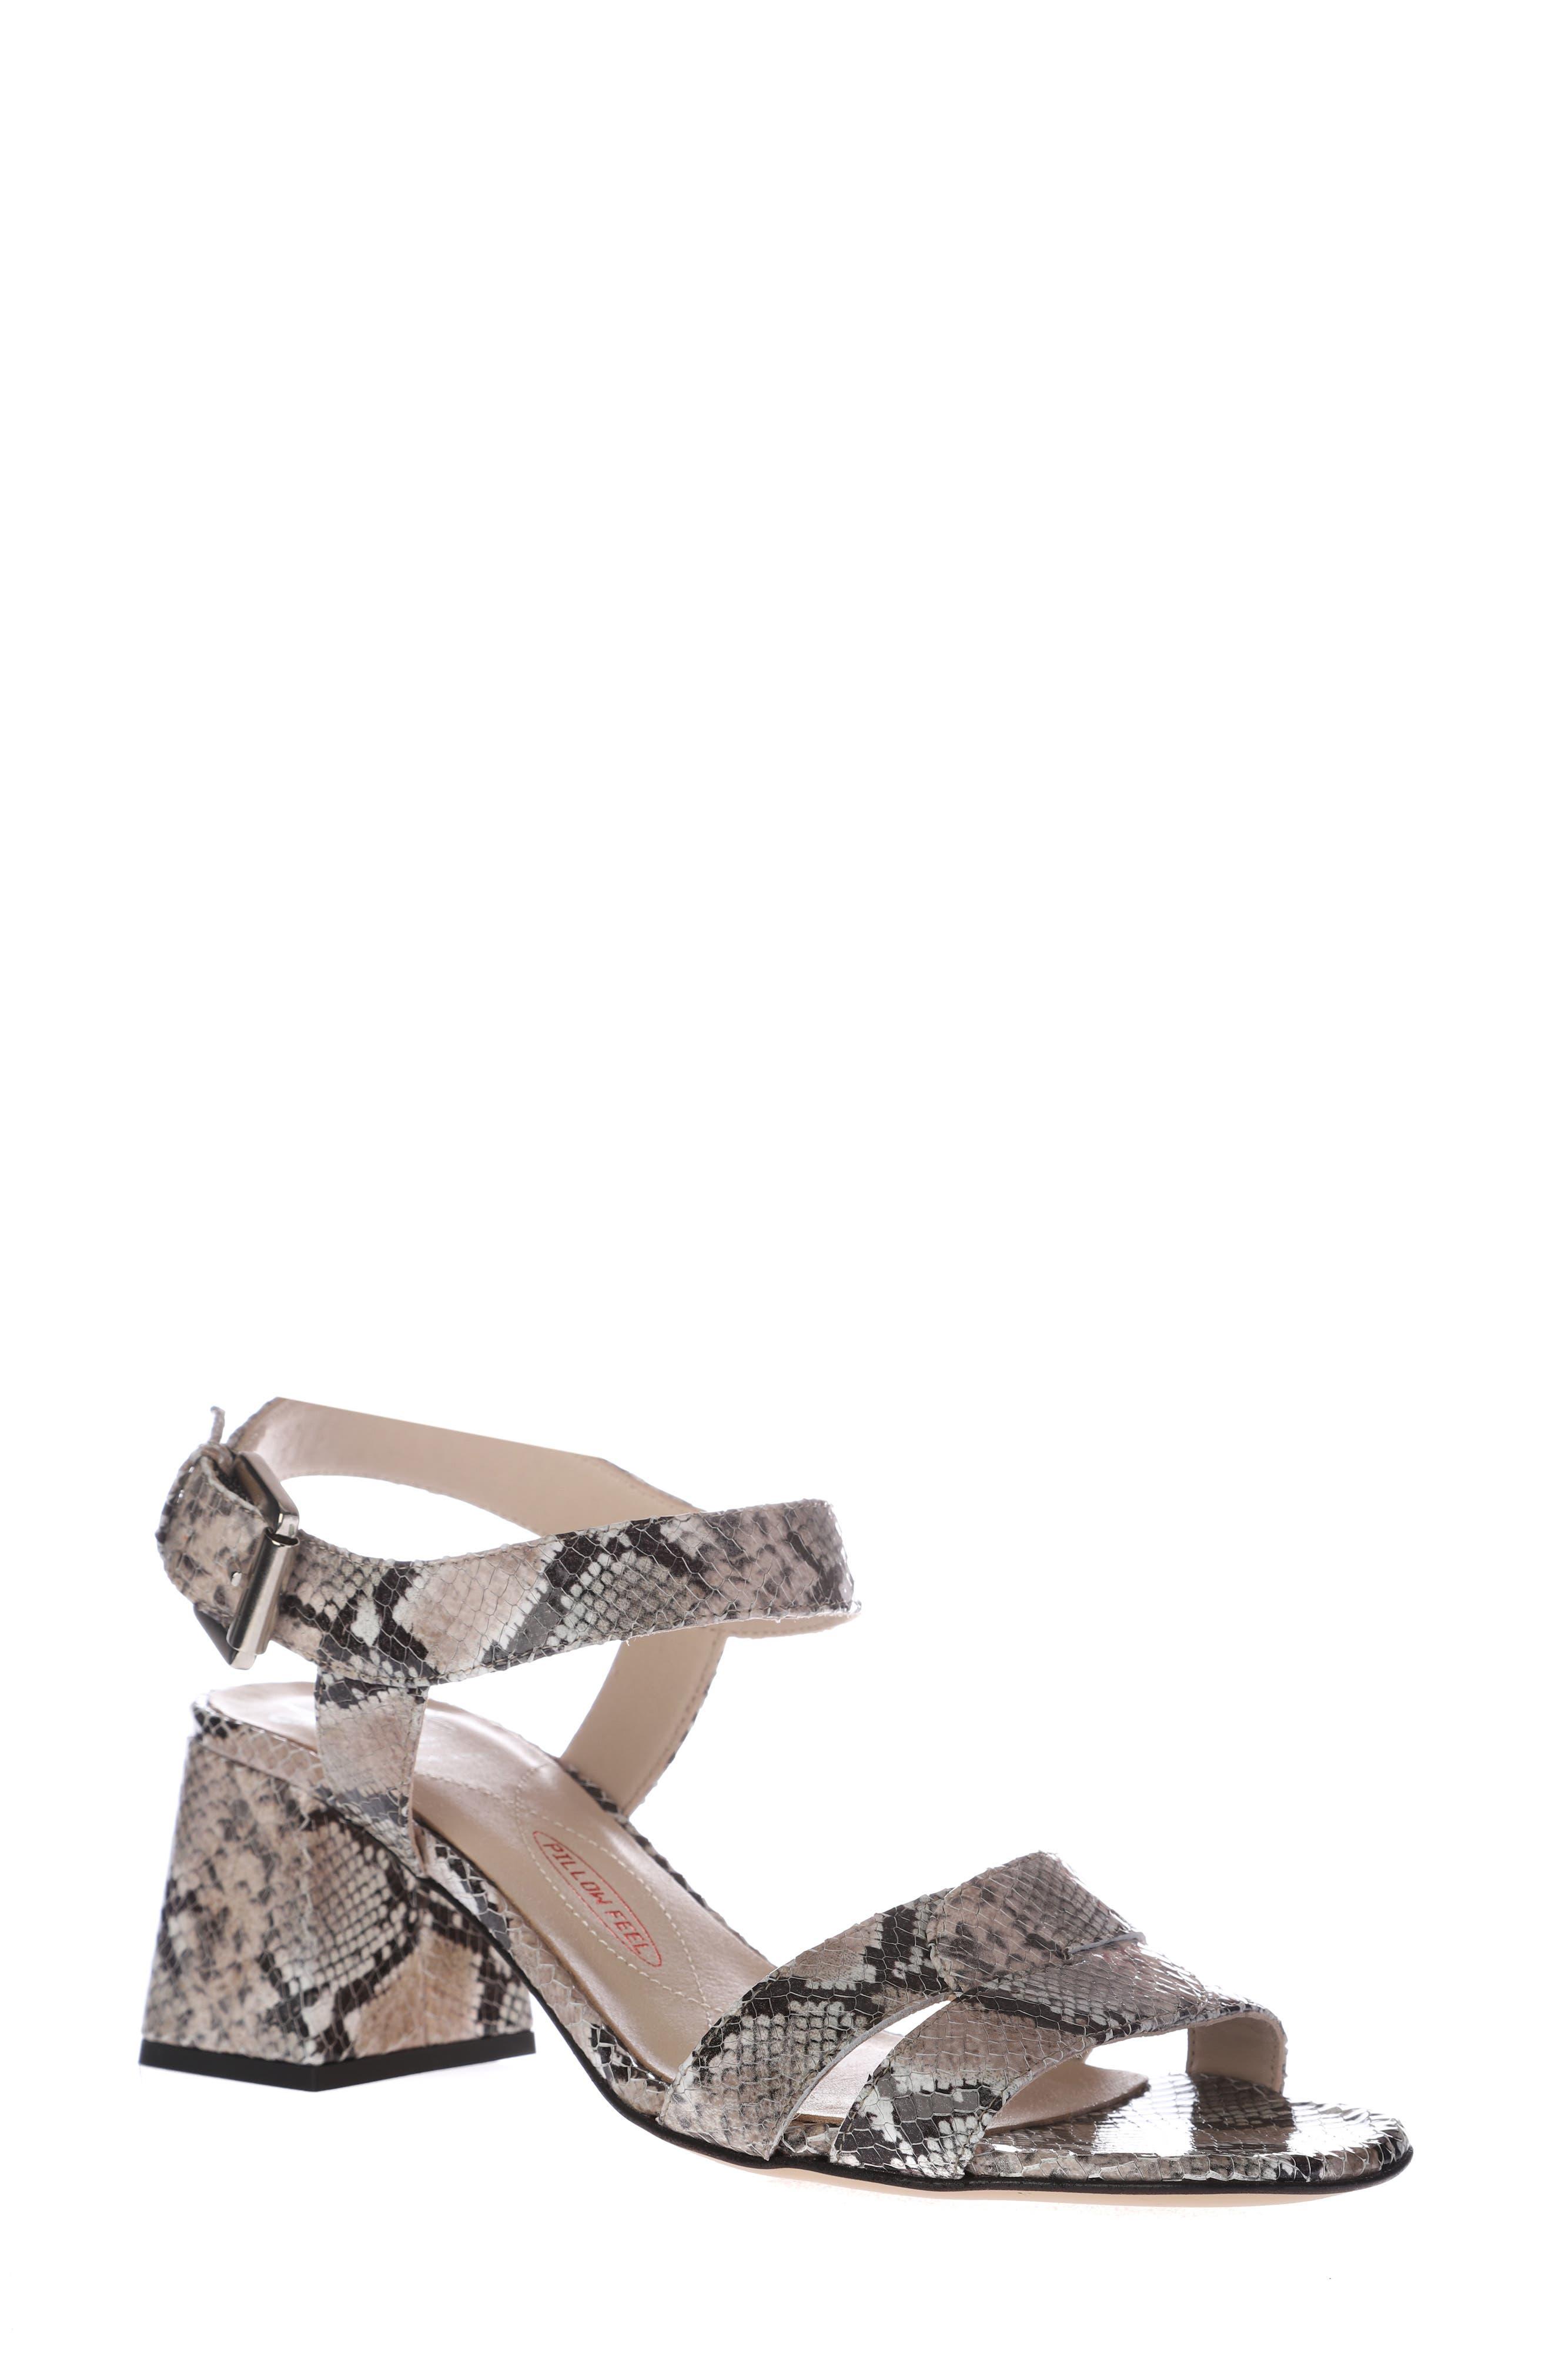 Ivonne Block Heel Sandal